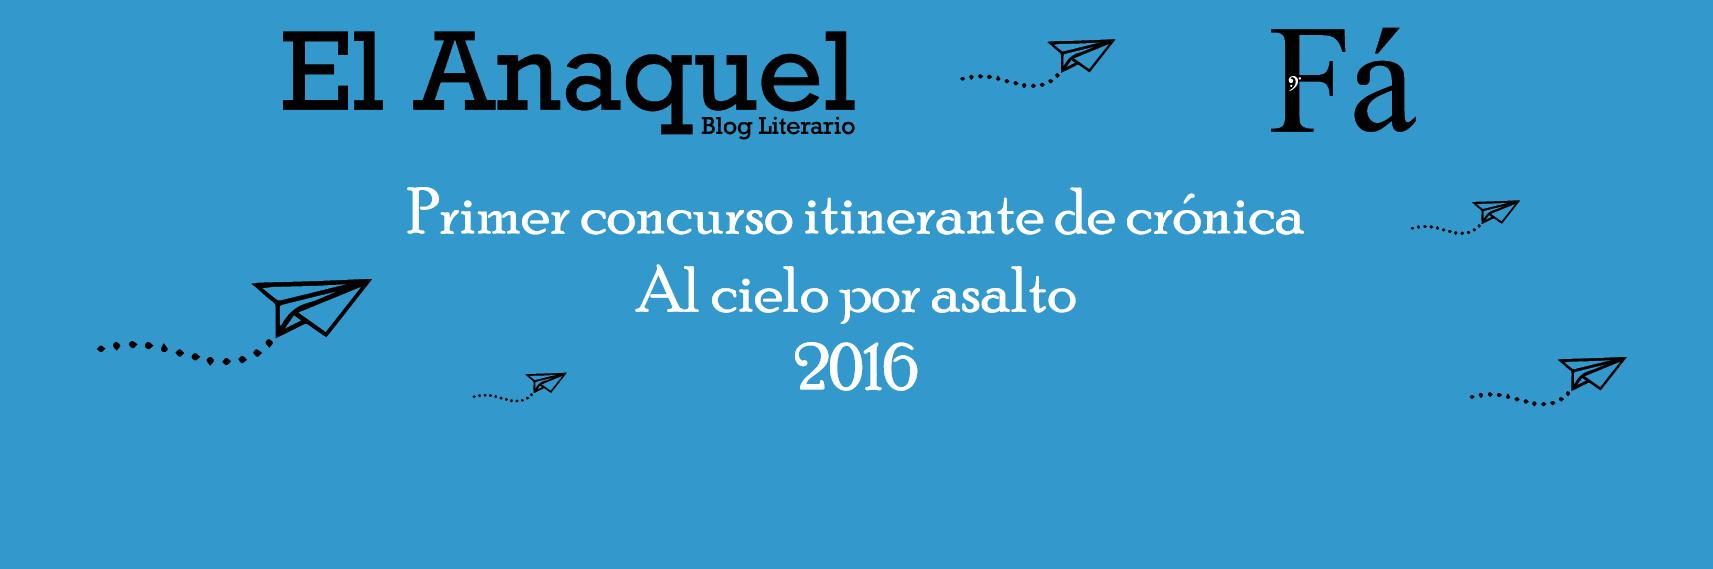 Primer concurso itinerante de crónica Al cielo por asalto 2016